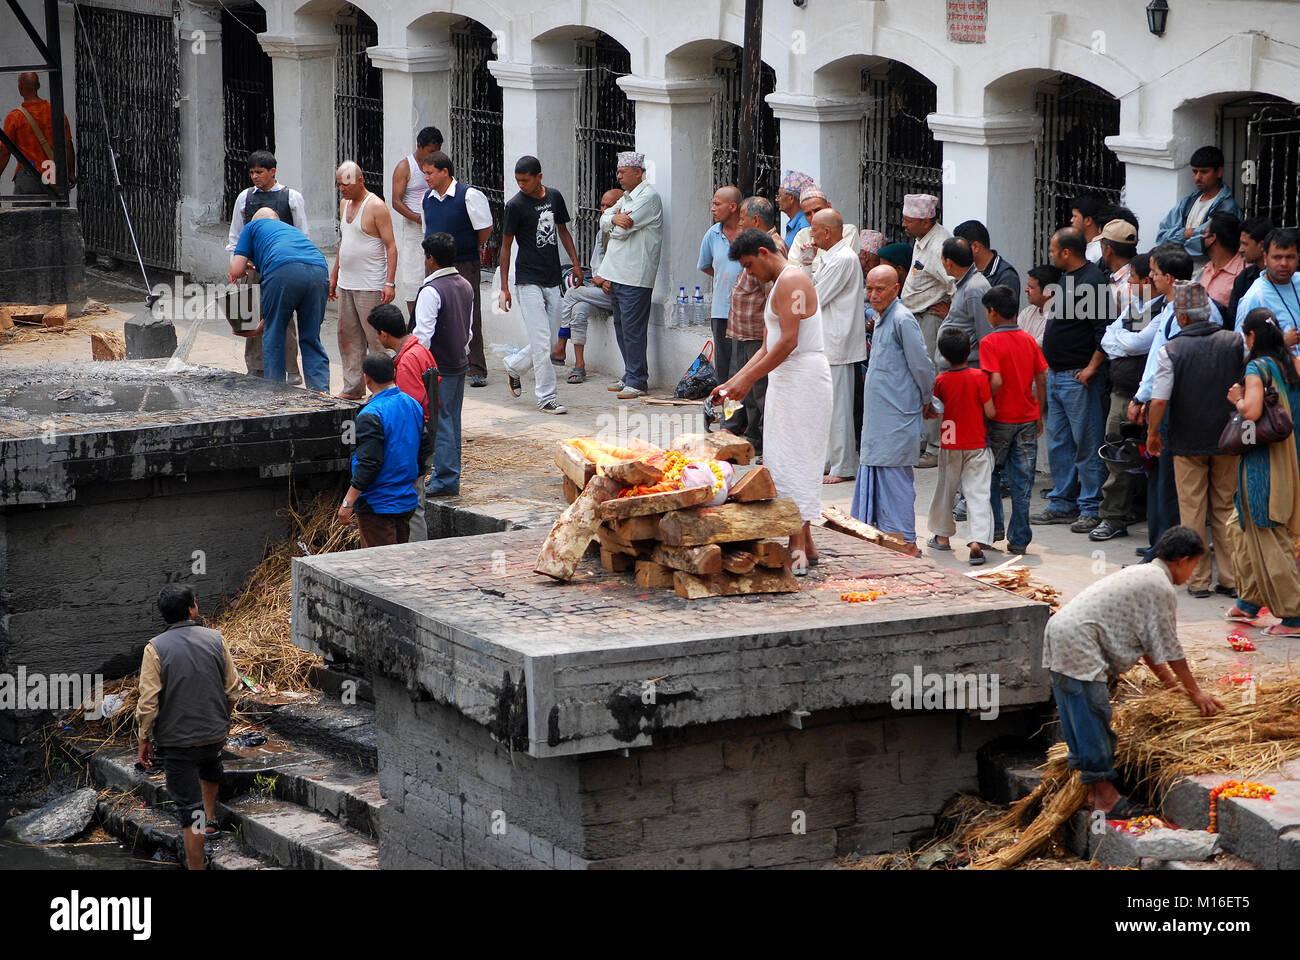 A Hindu funeral at Pashupatinath Temple on the banks of the Bagmati River Kathmandu, Nepal - Stock Image